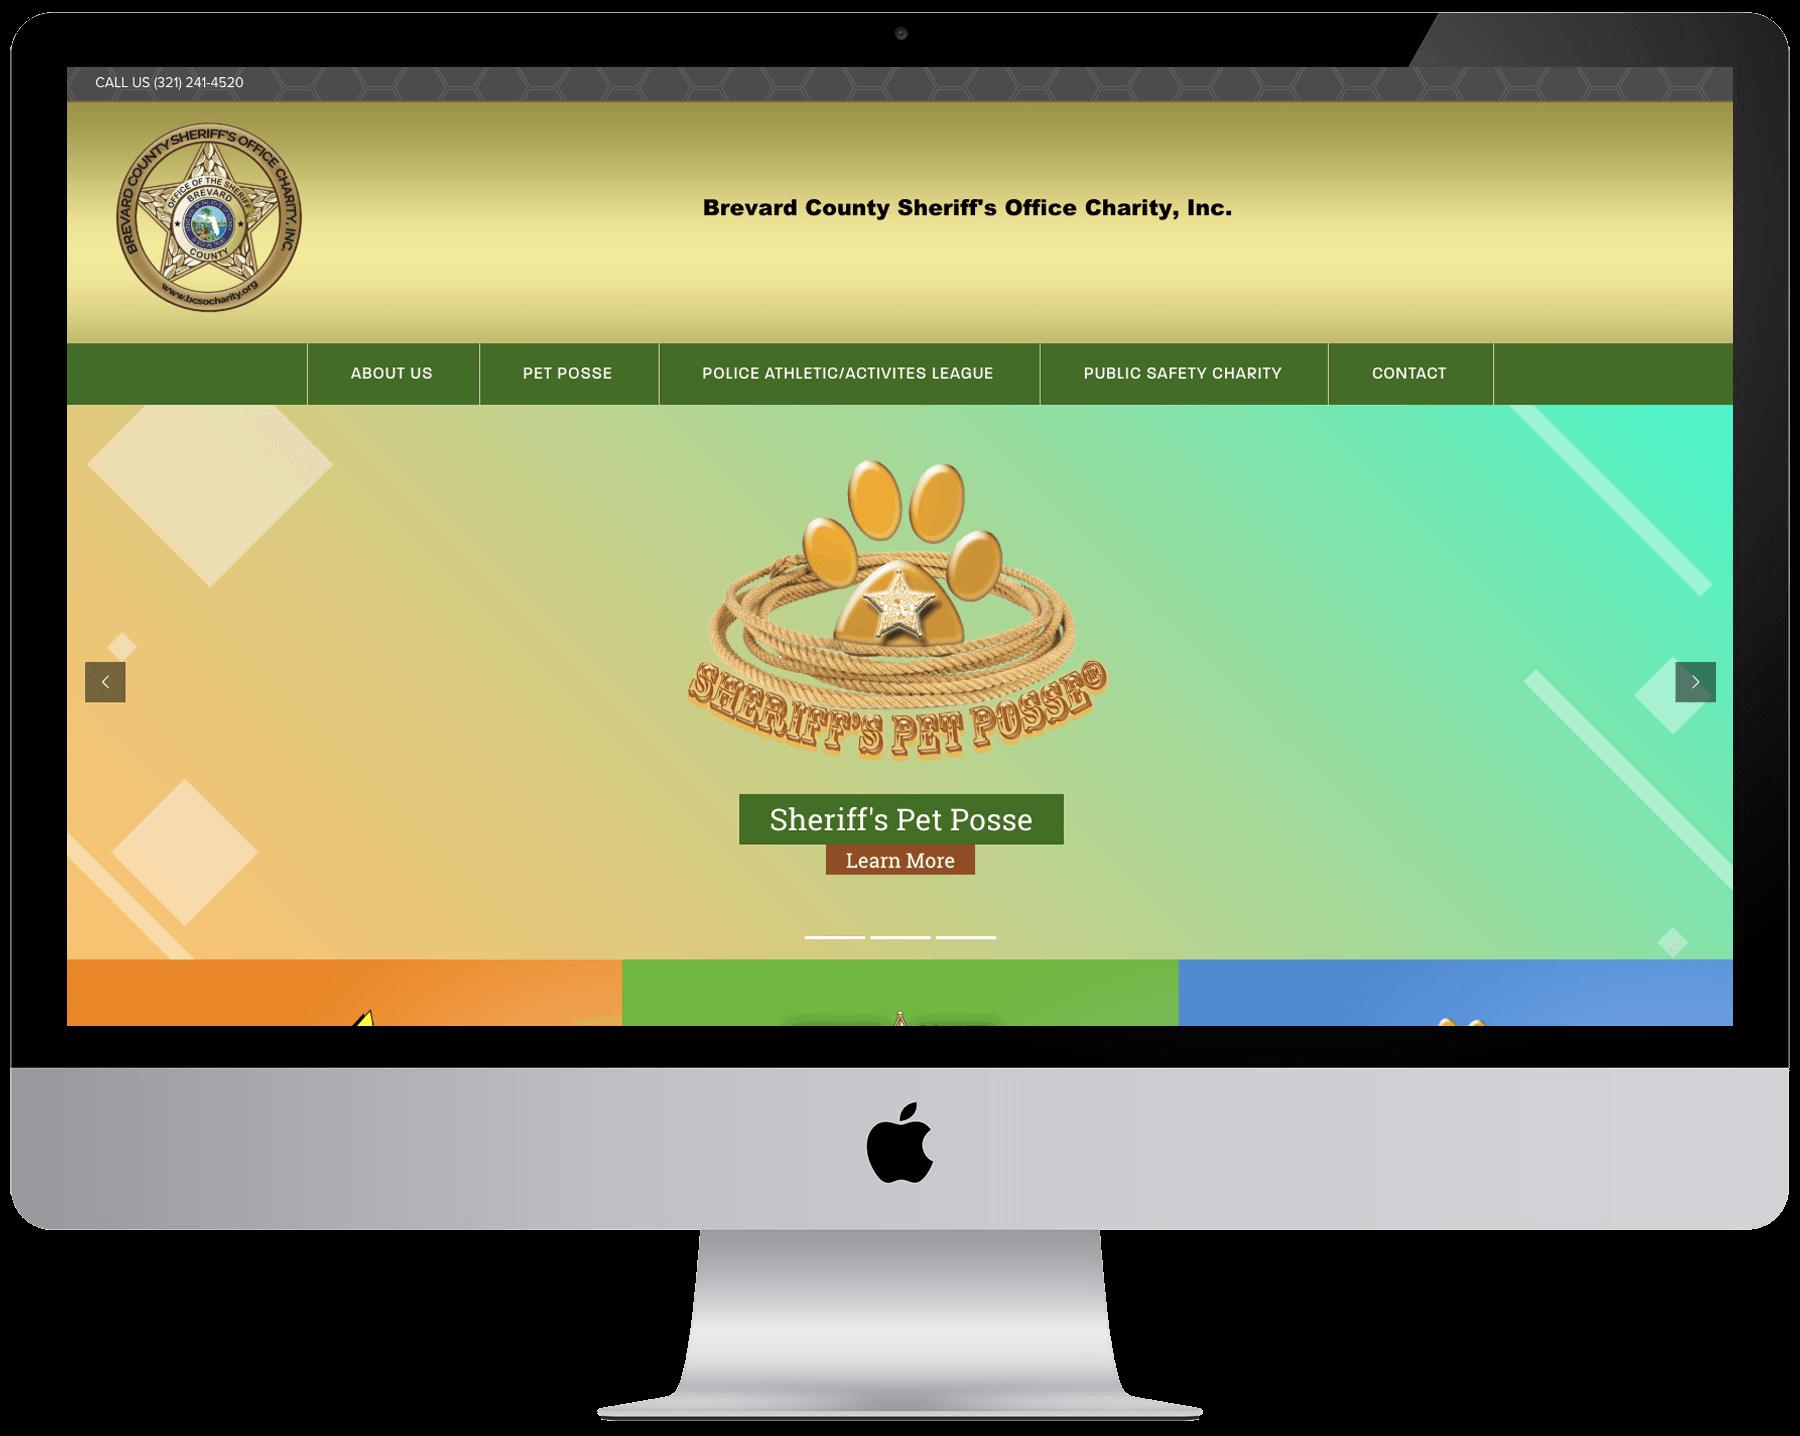 Brevard County Sheriff's Office Charity Website